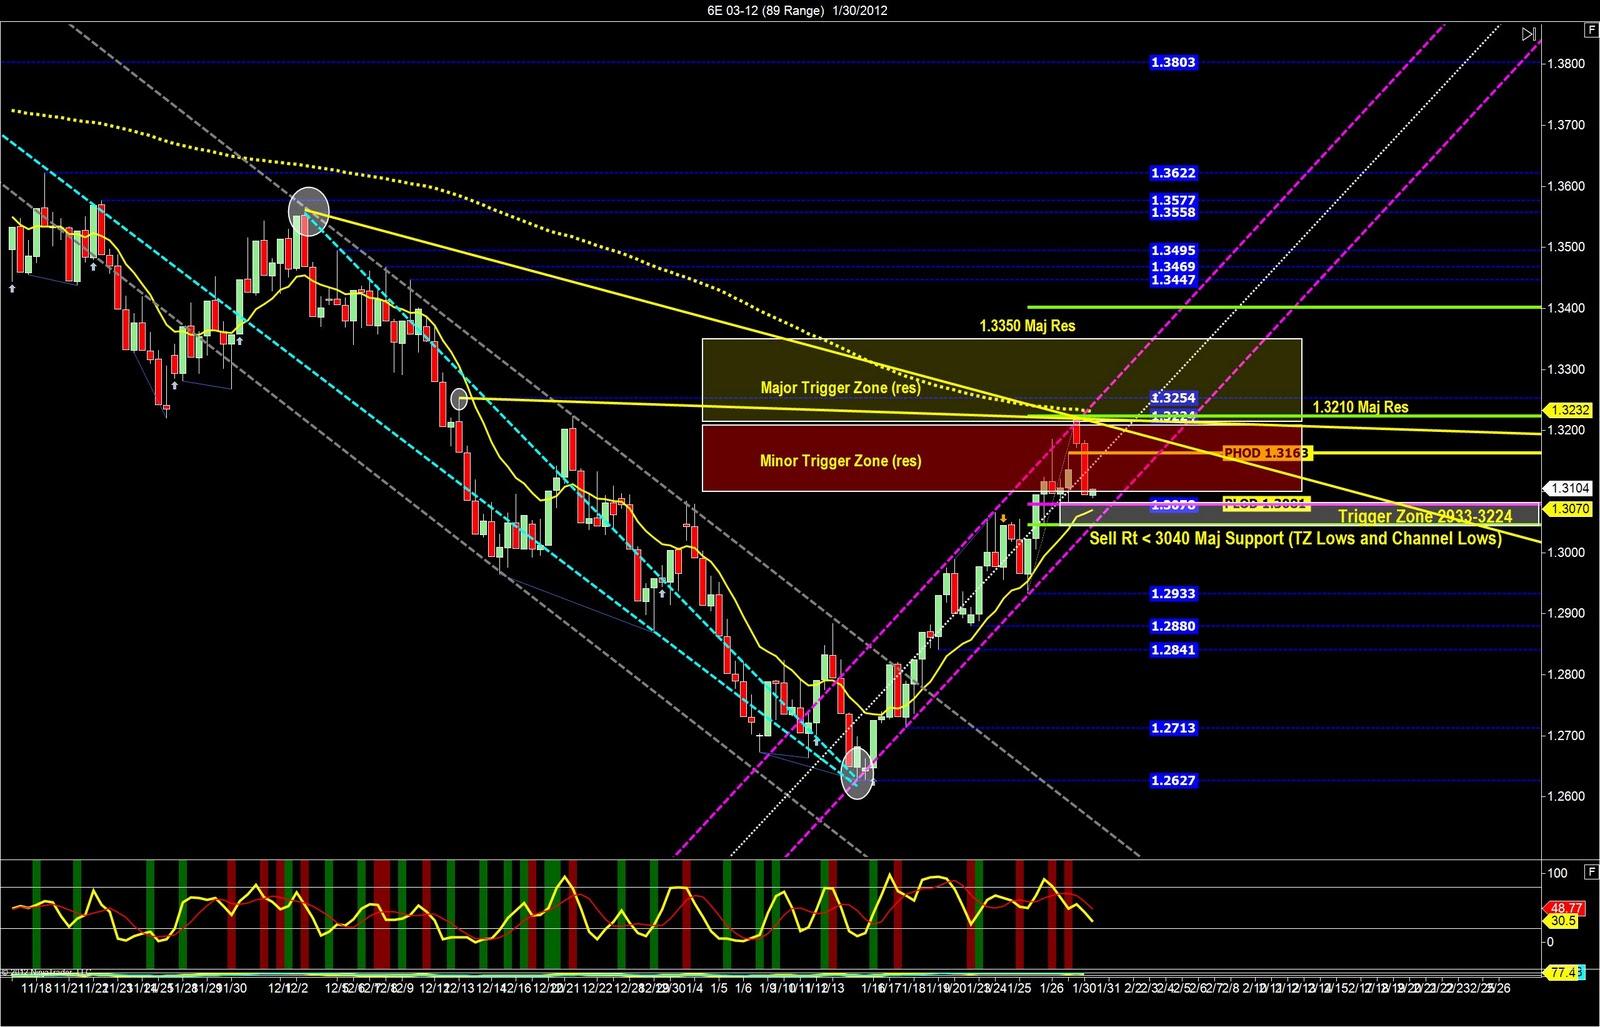 Low risk high reward trading strategy